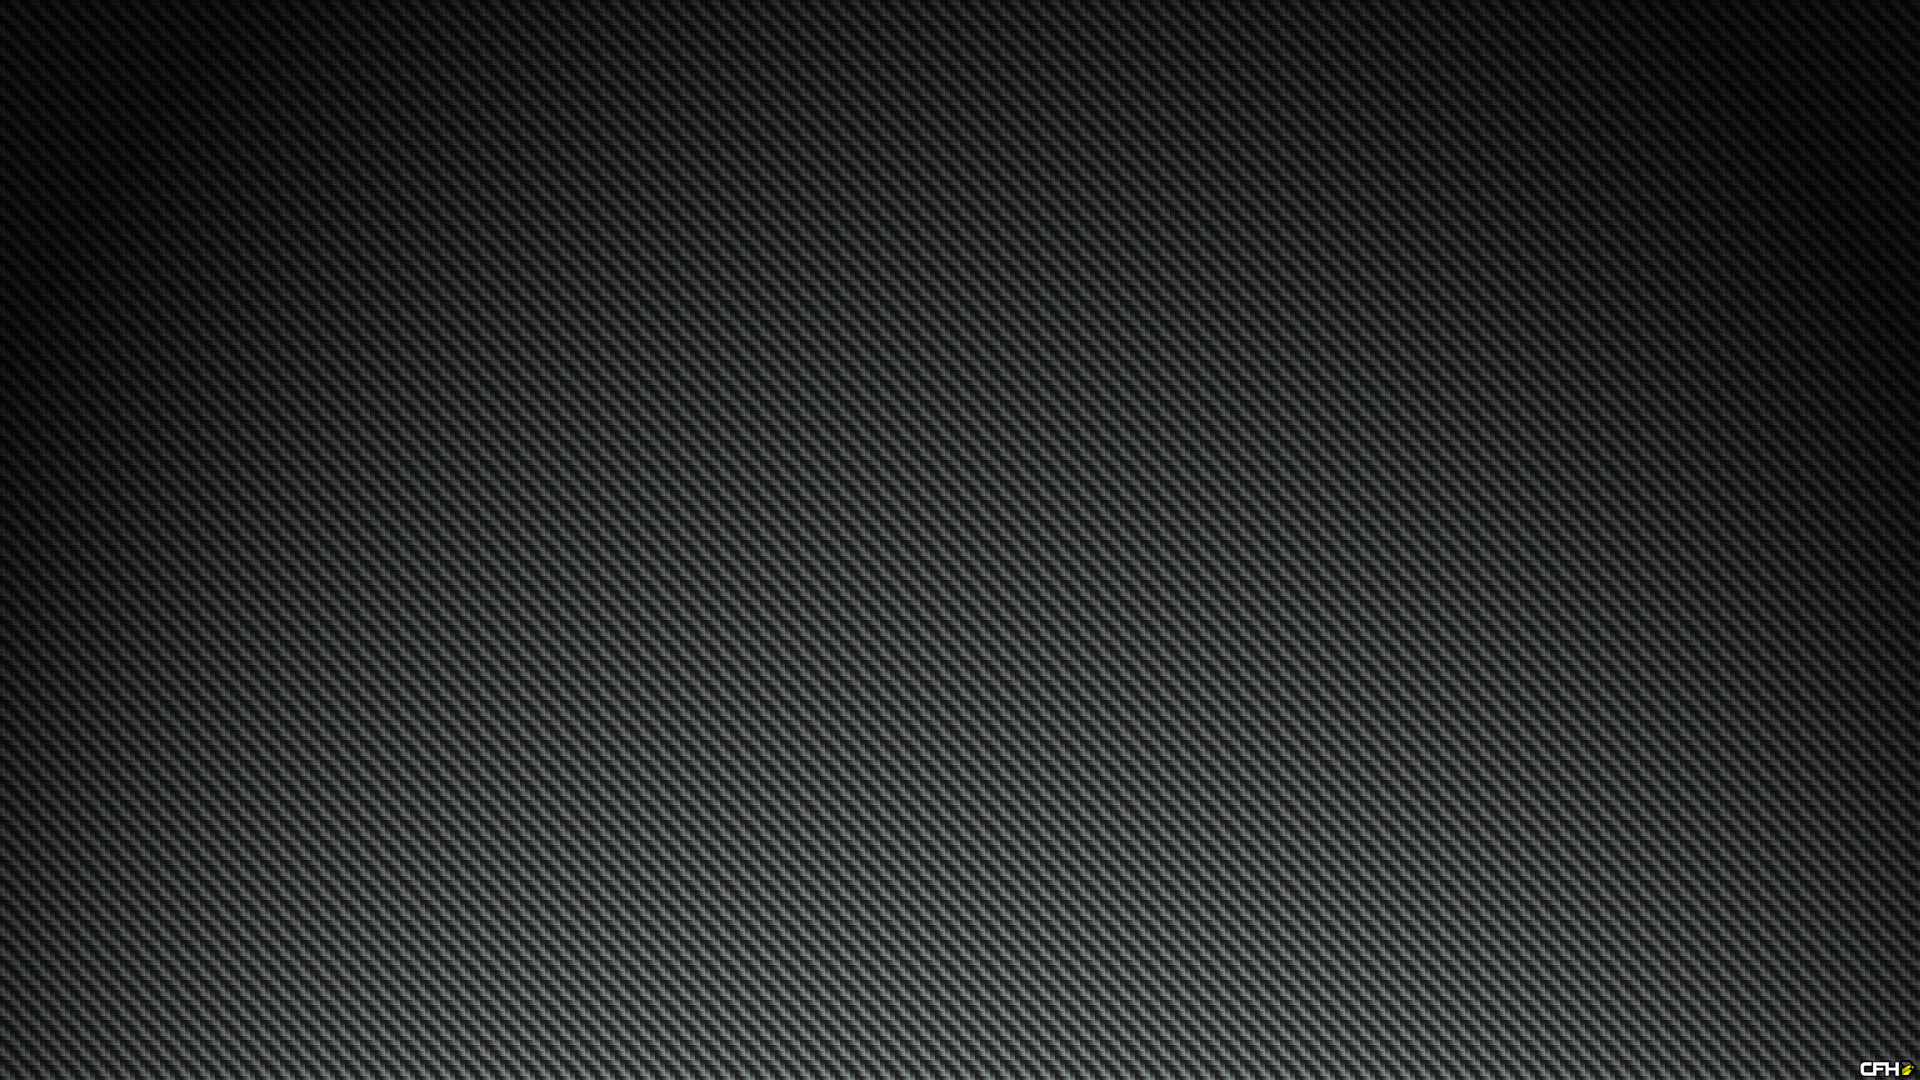 1080 in carbon fiber wallpaper 19201080 Previous Next 1920x1080